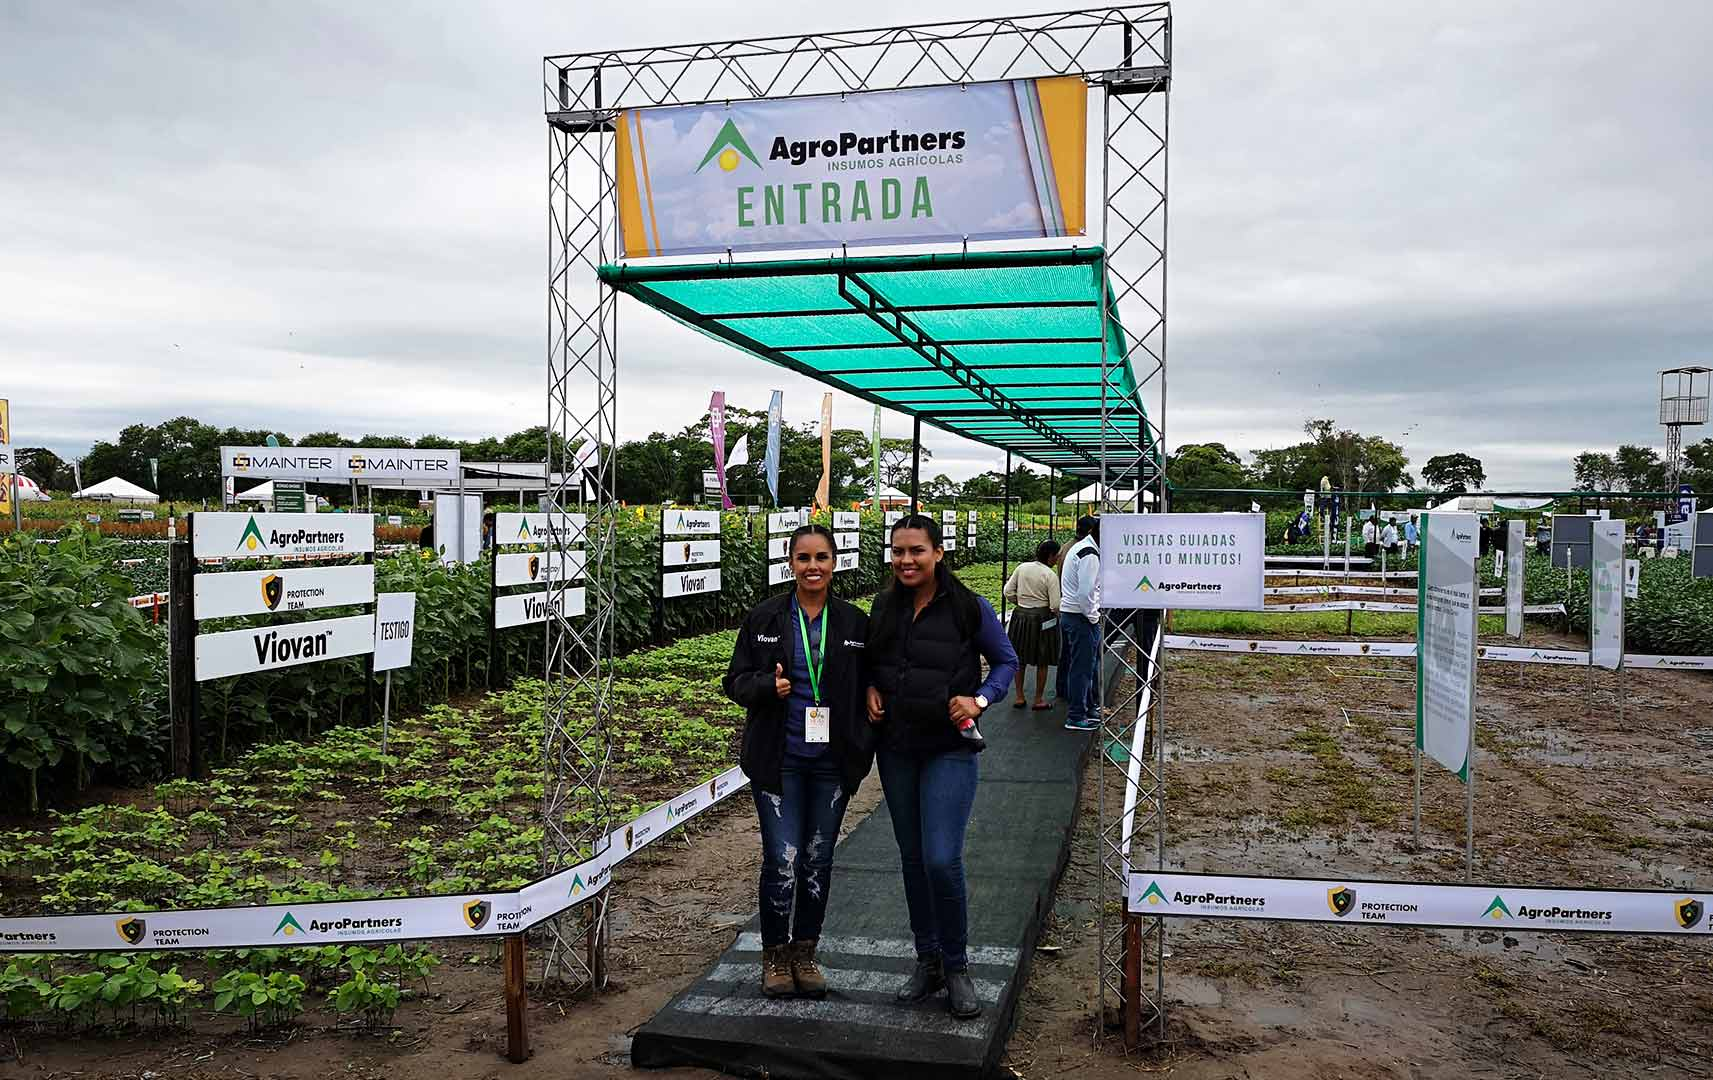 AgroPartners